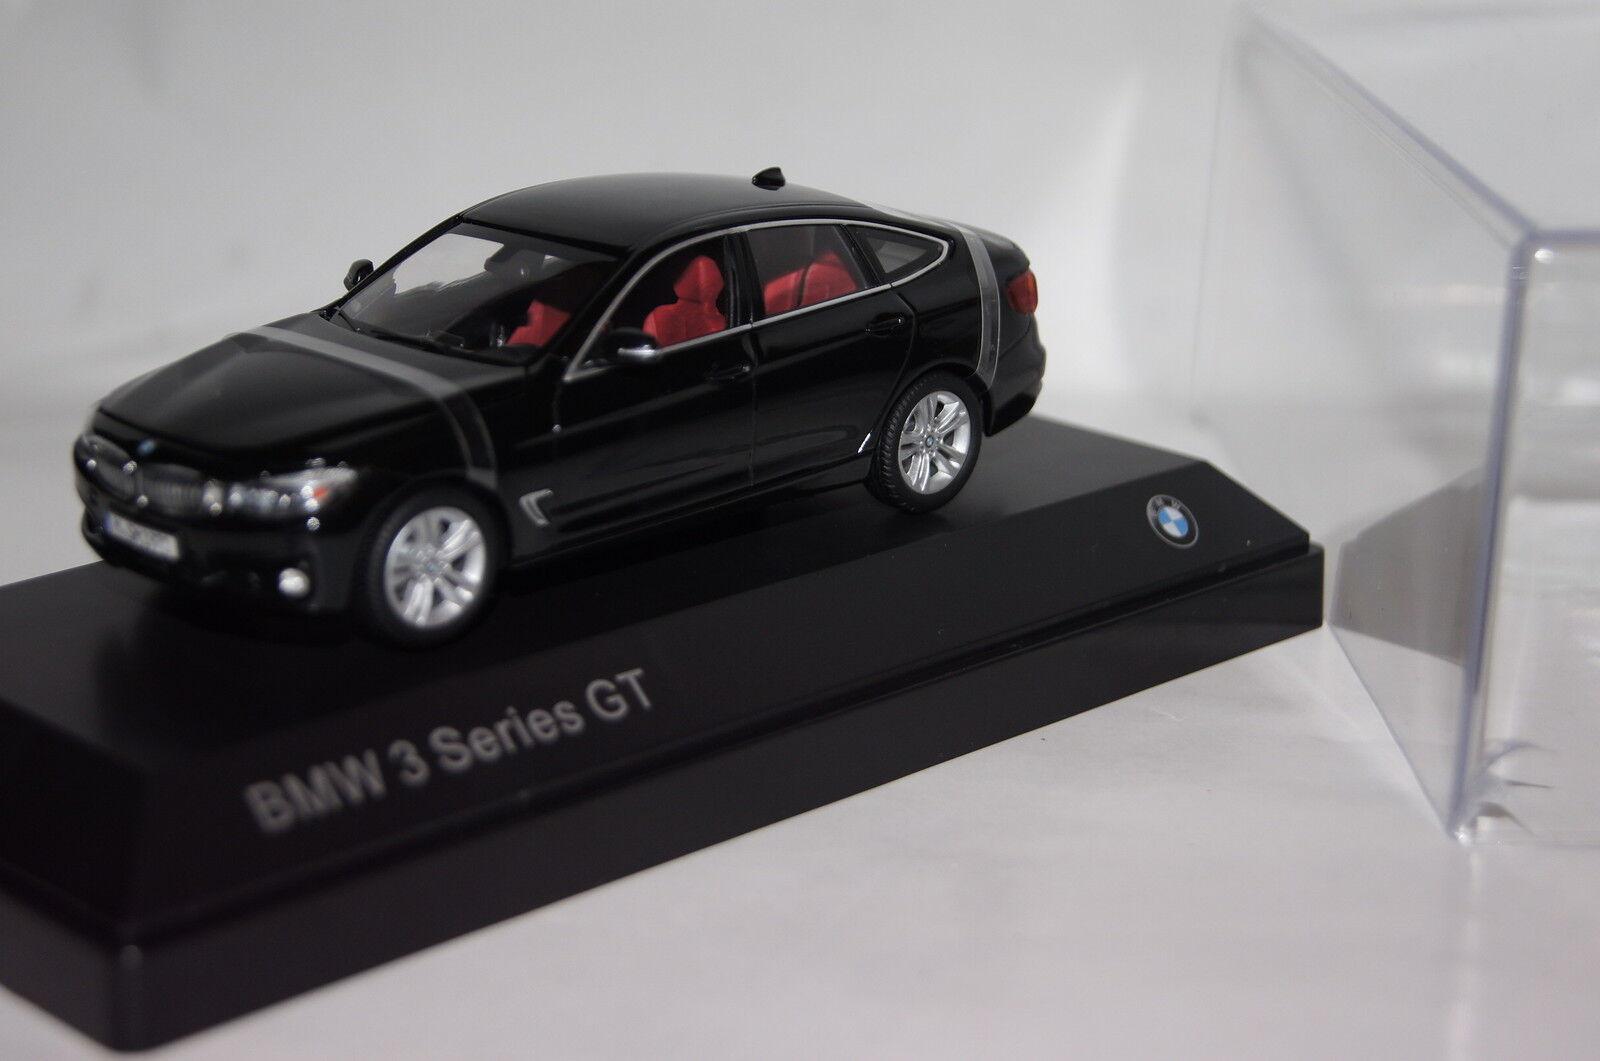 BMW 3er GT 2013 Noir sapphiremetallic BMW Nouveau & OVP 80422297635